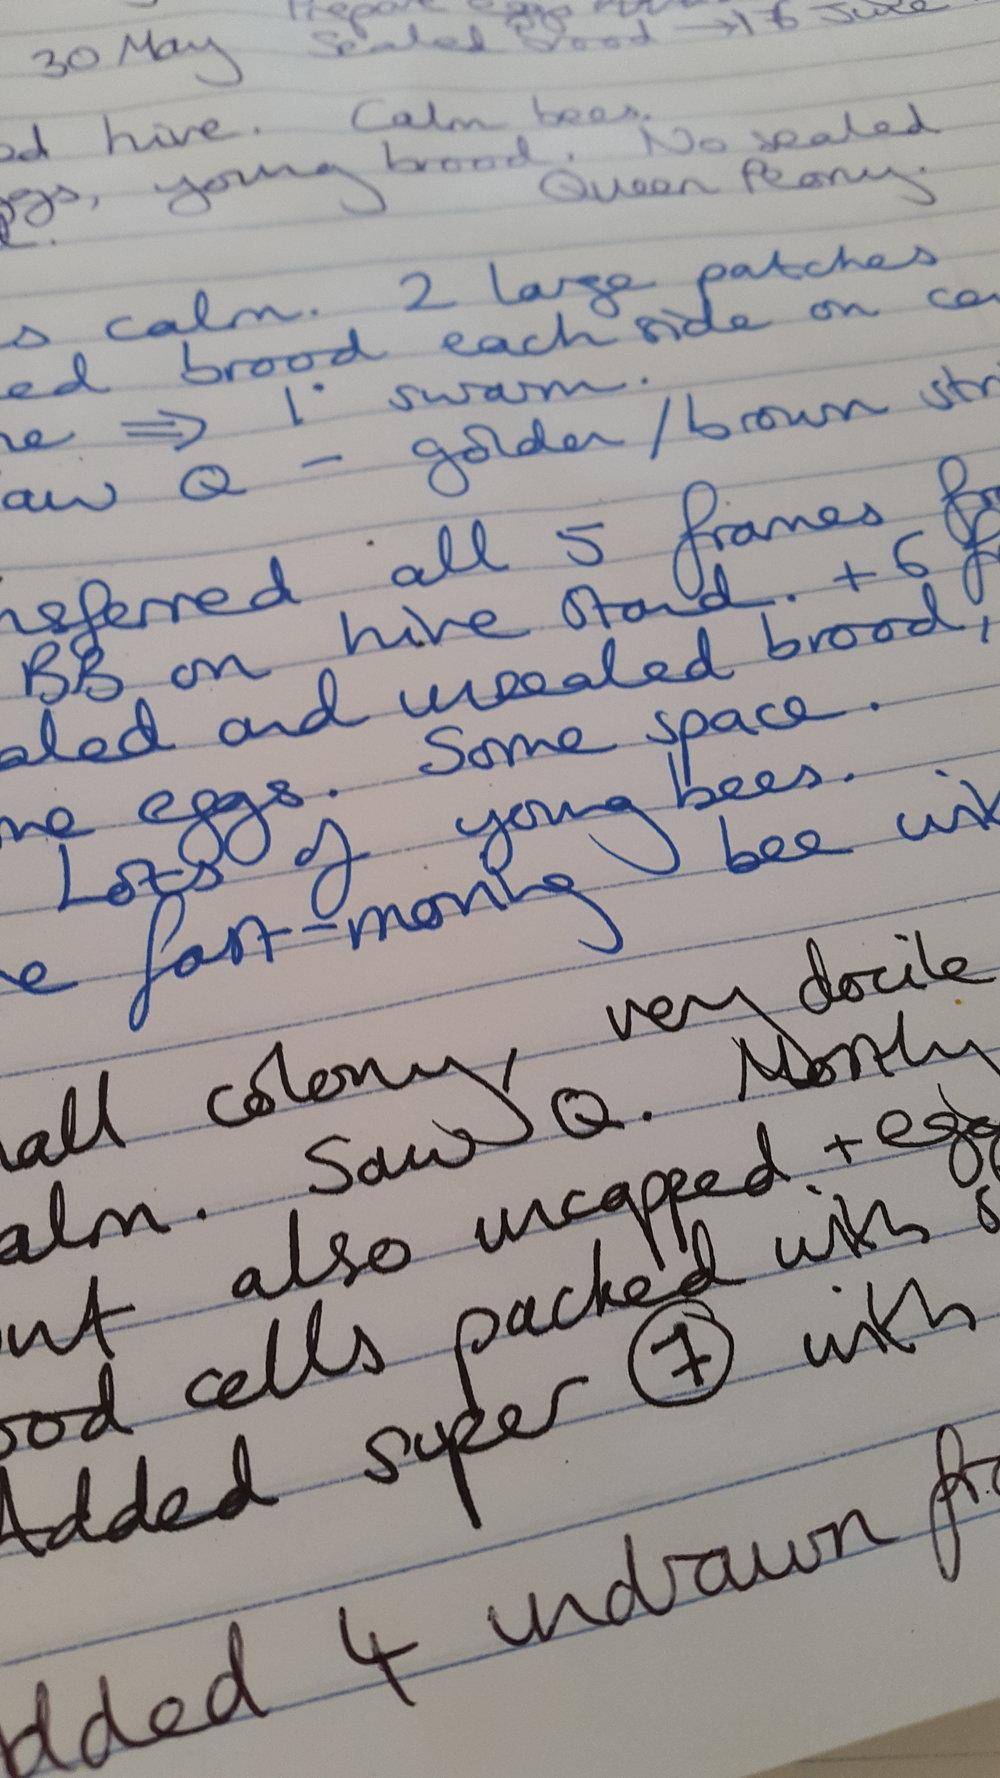 Beekeeper's notes